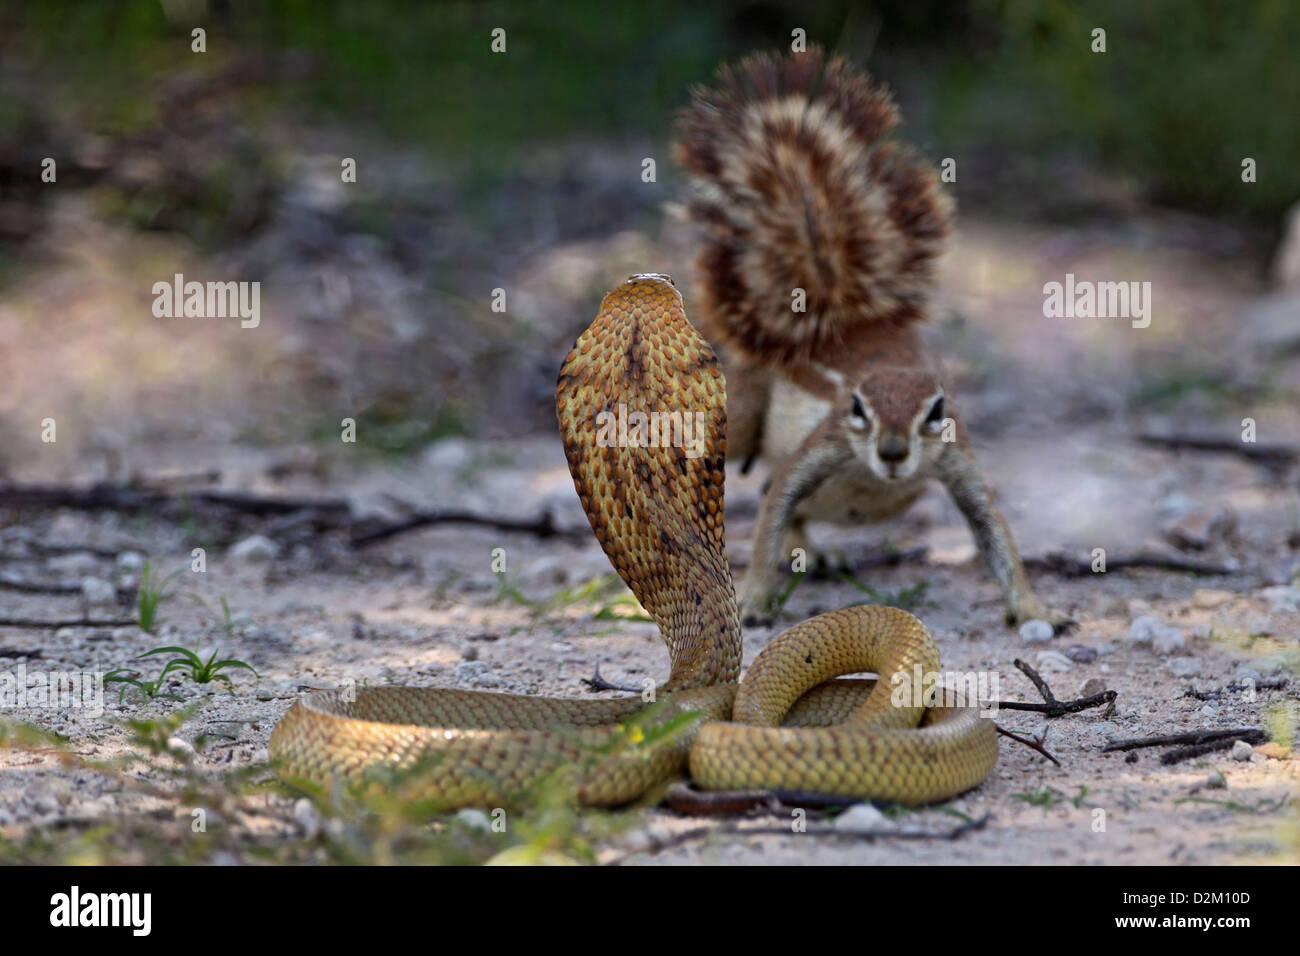 Cape cobra, yellow cobra threatening gesture, South Africa, Kalahari, Kgalagadi Transfrontier Park, ground squirrel - Stock Image